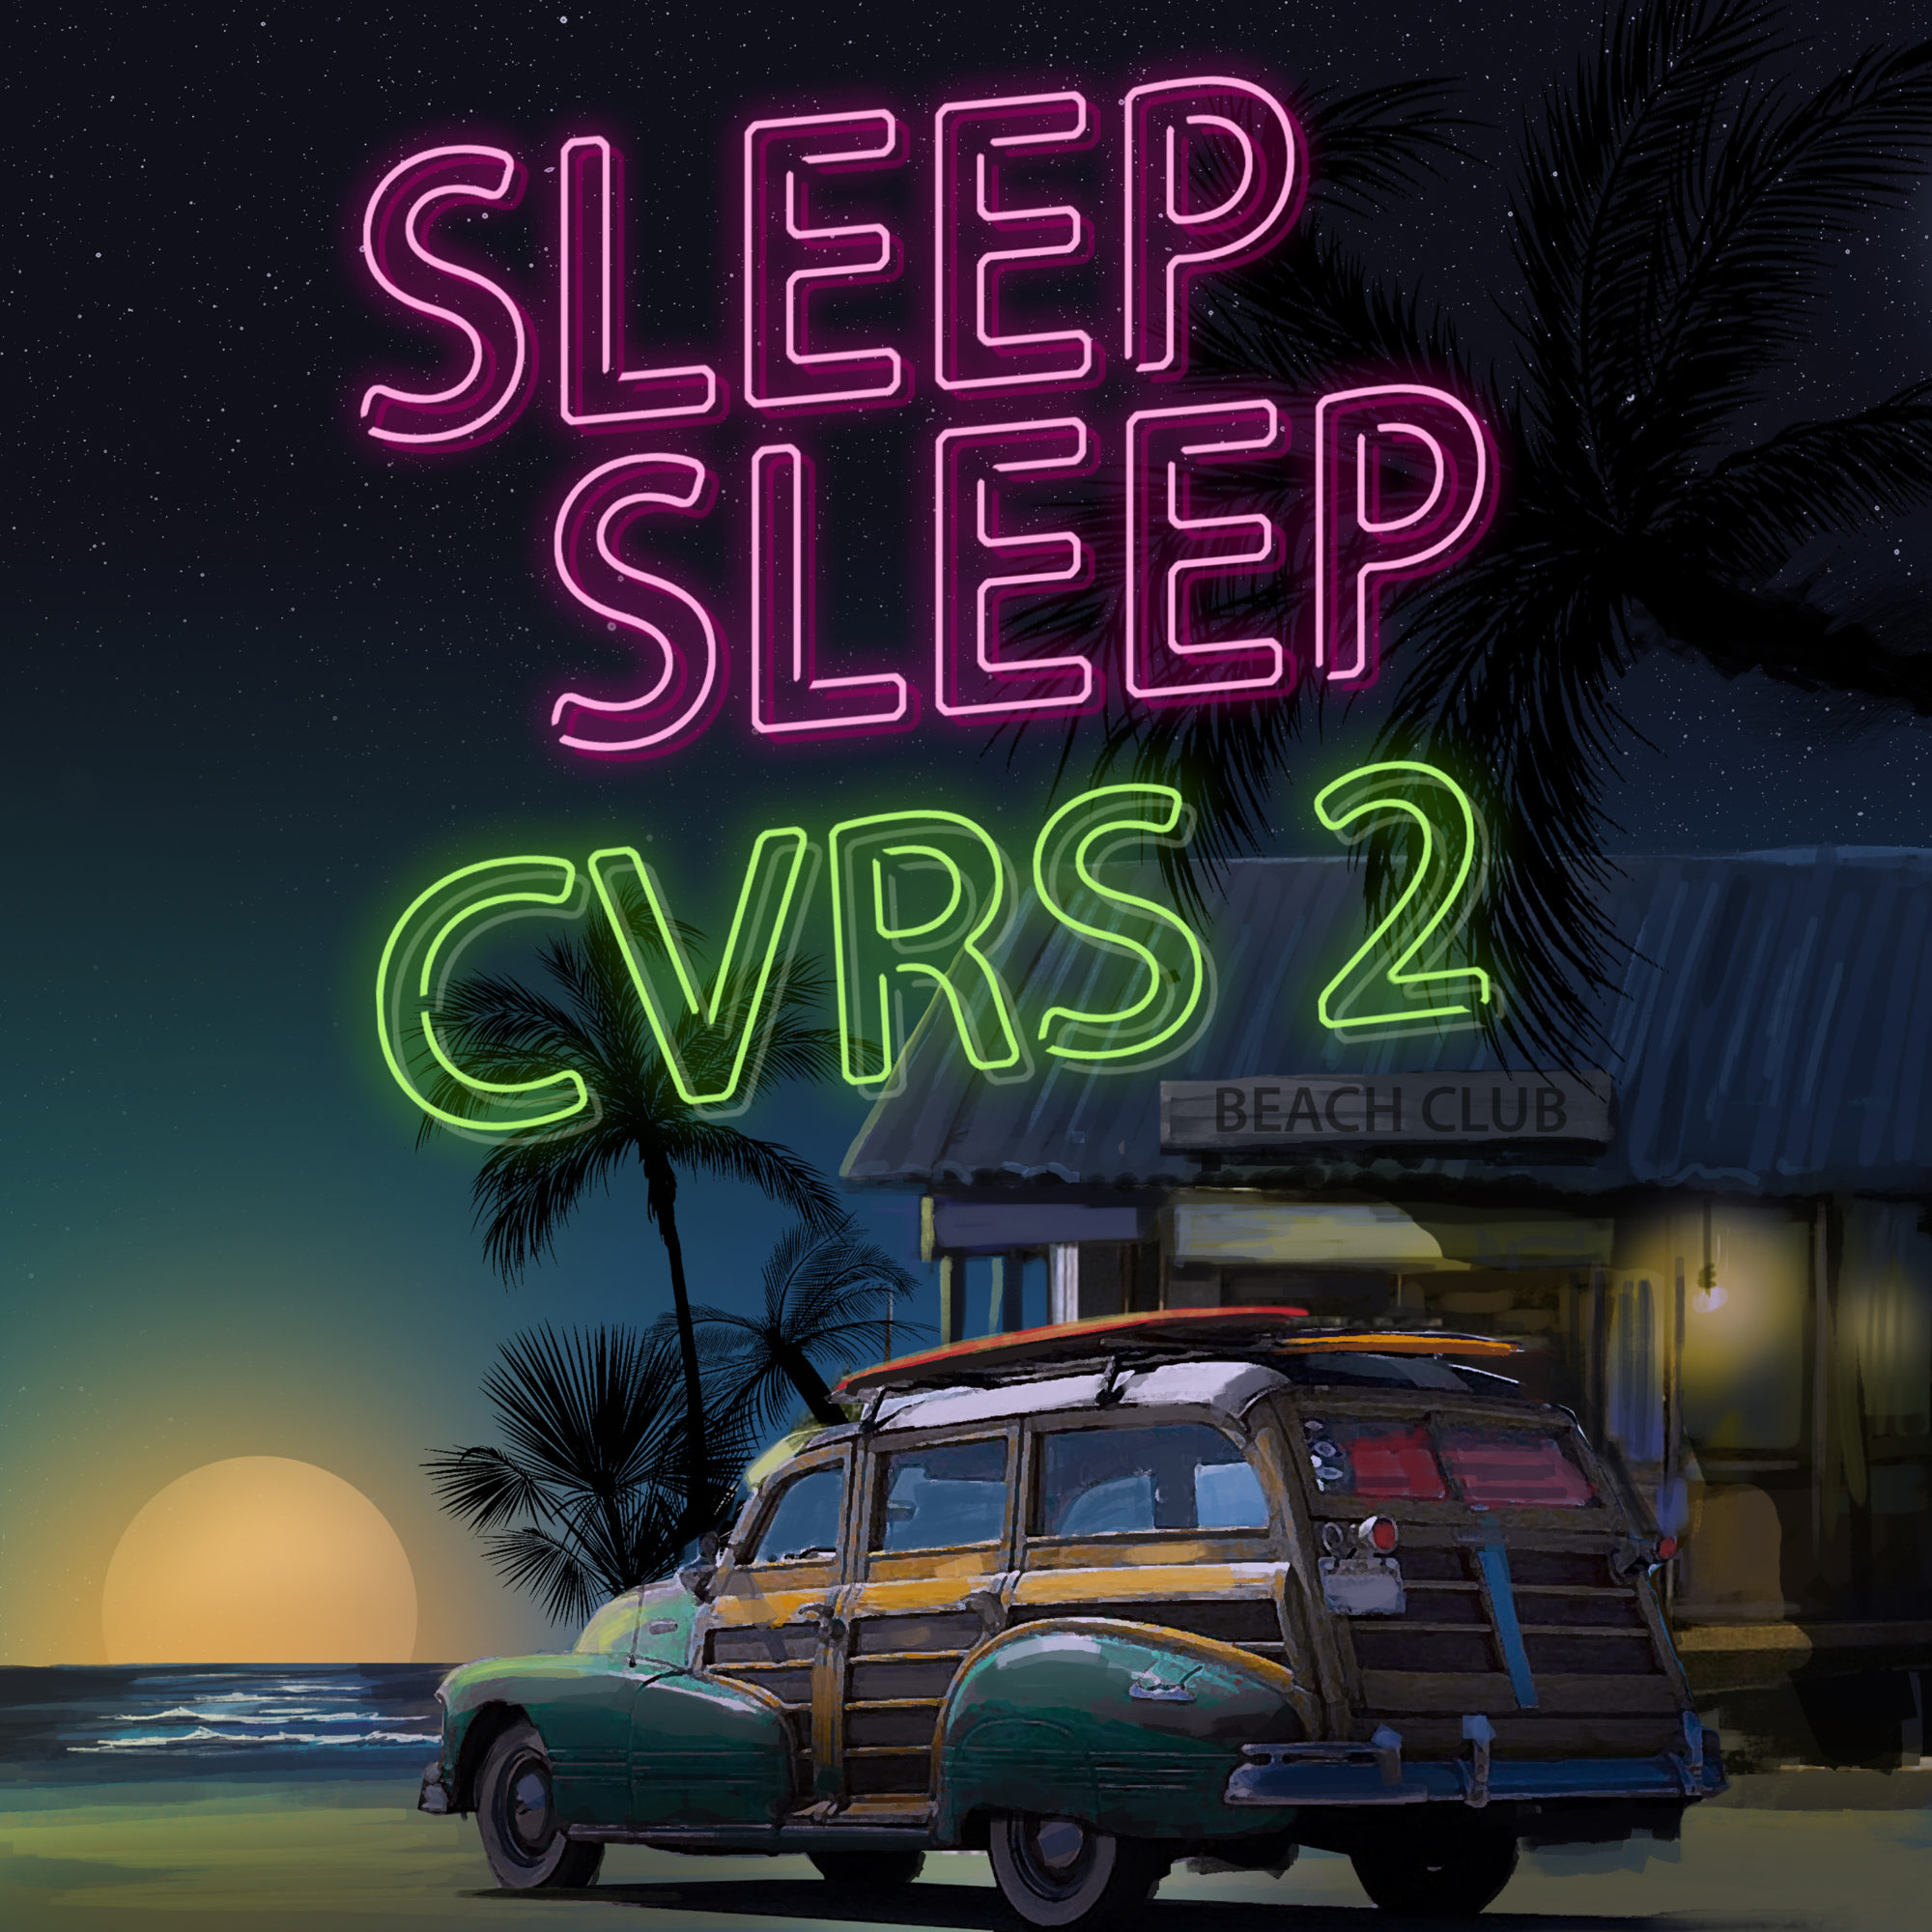 Sleep Sleep Band Music Austria cvrs 2 Artwork